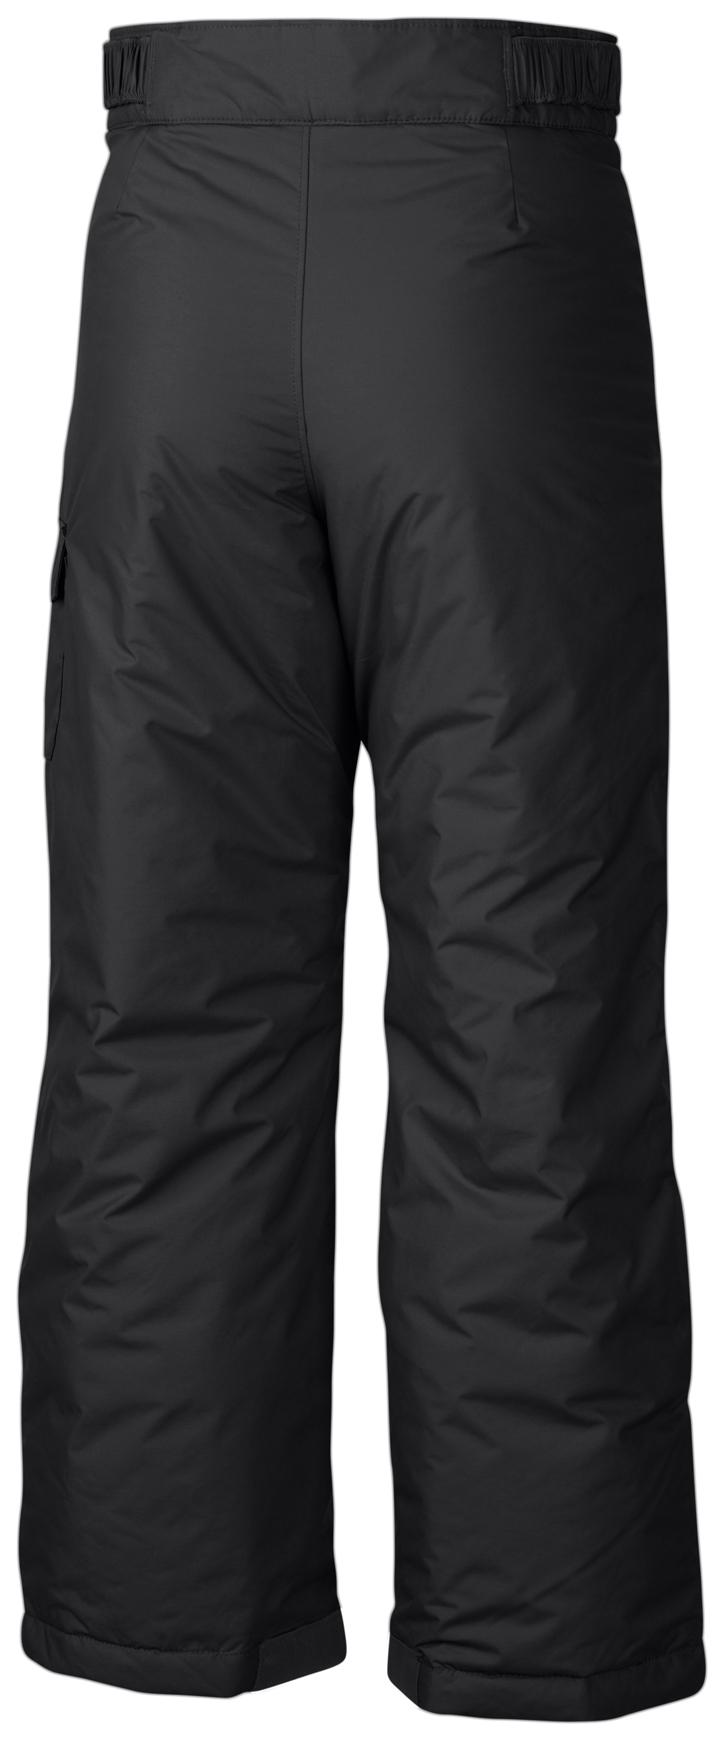 Pantalons Black Snowleader Starchaser Ii Peak Ski Columbia Pant xqtTgS7